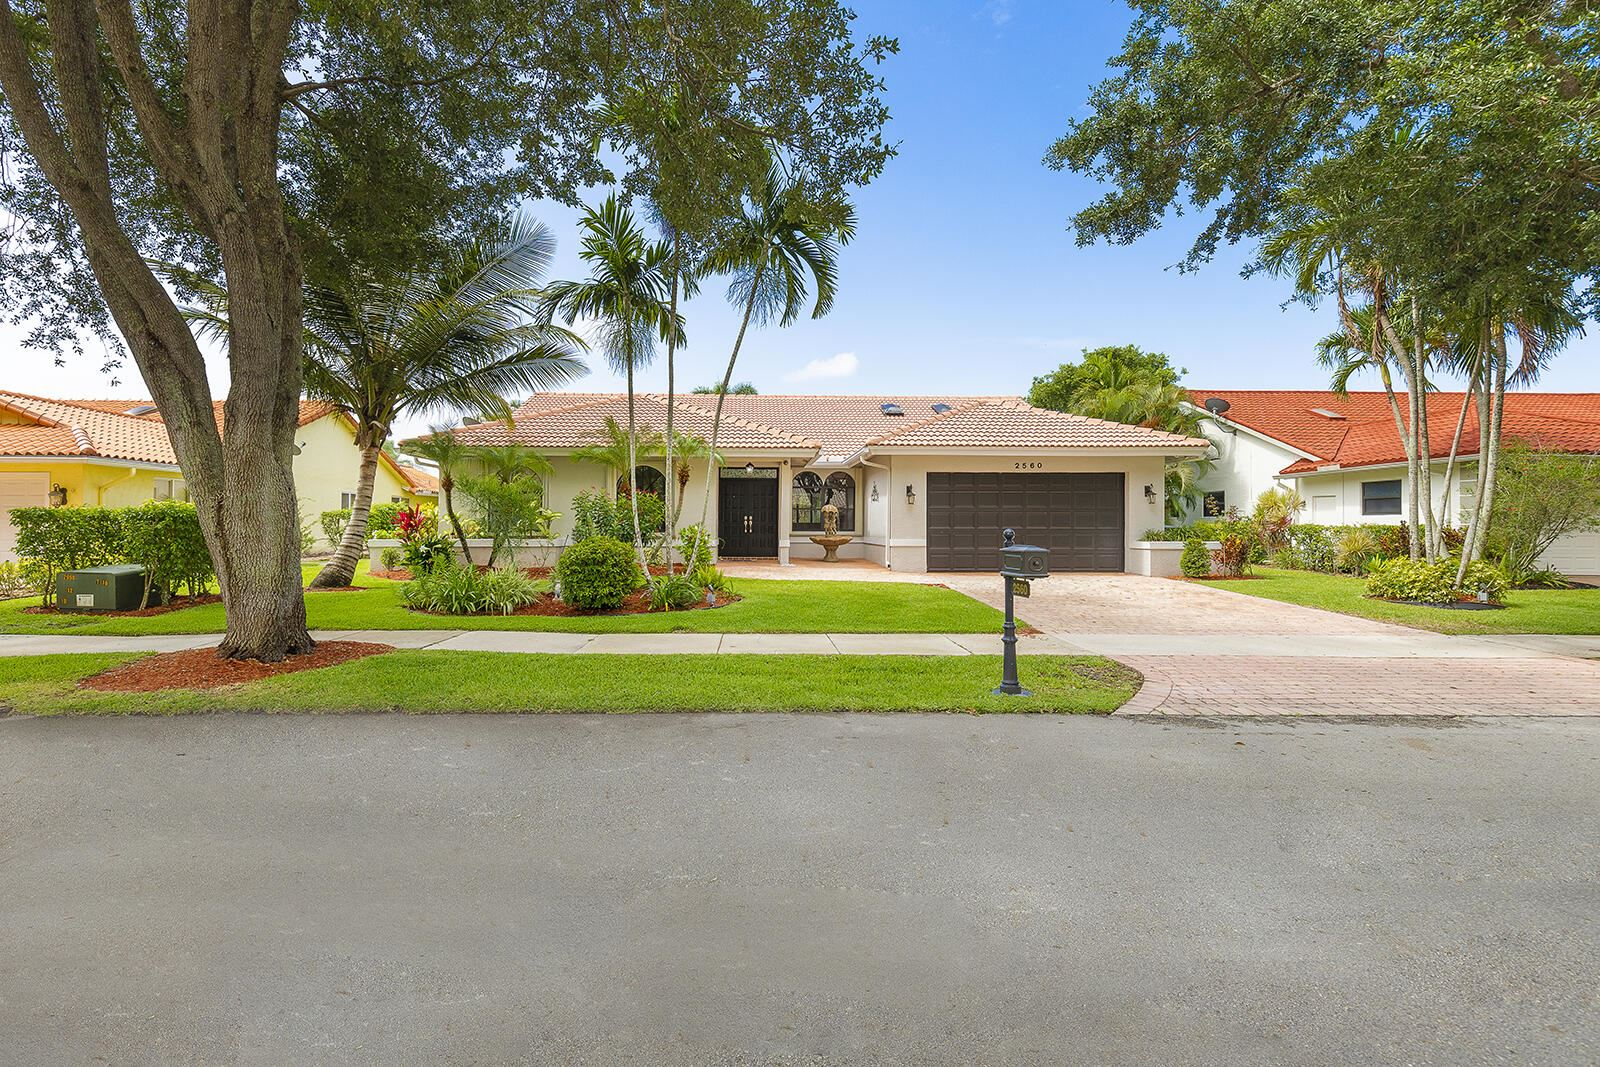 2560 NW 40th Street, Boca Raton, FL 33434 - #: RX-10725720